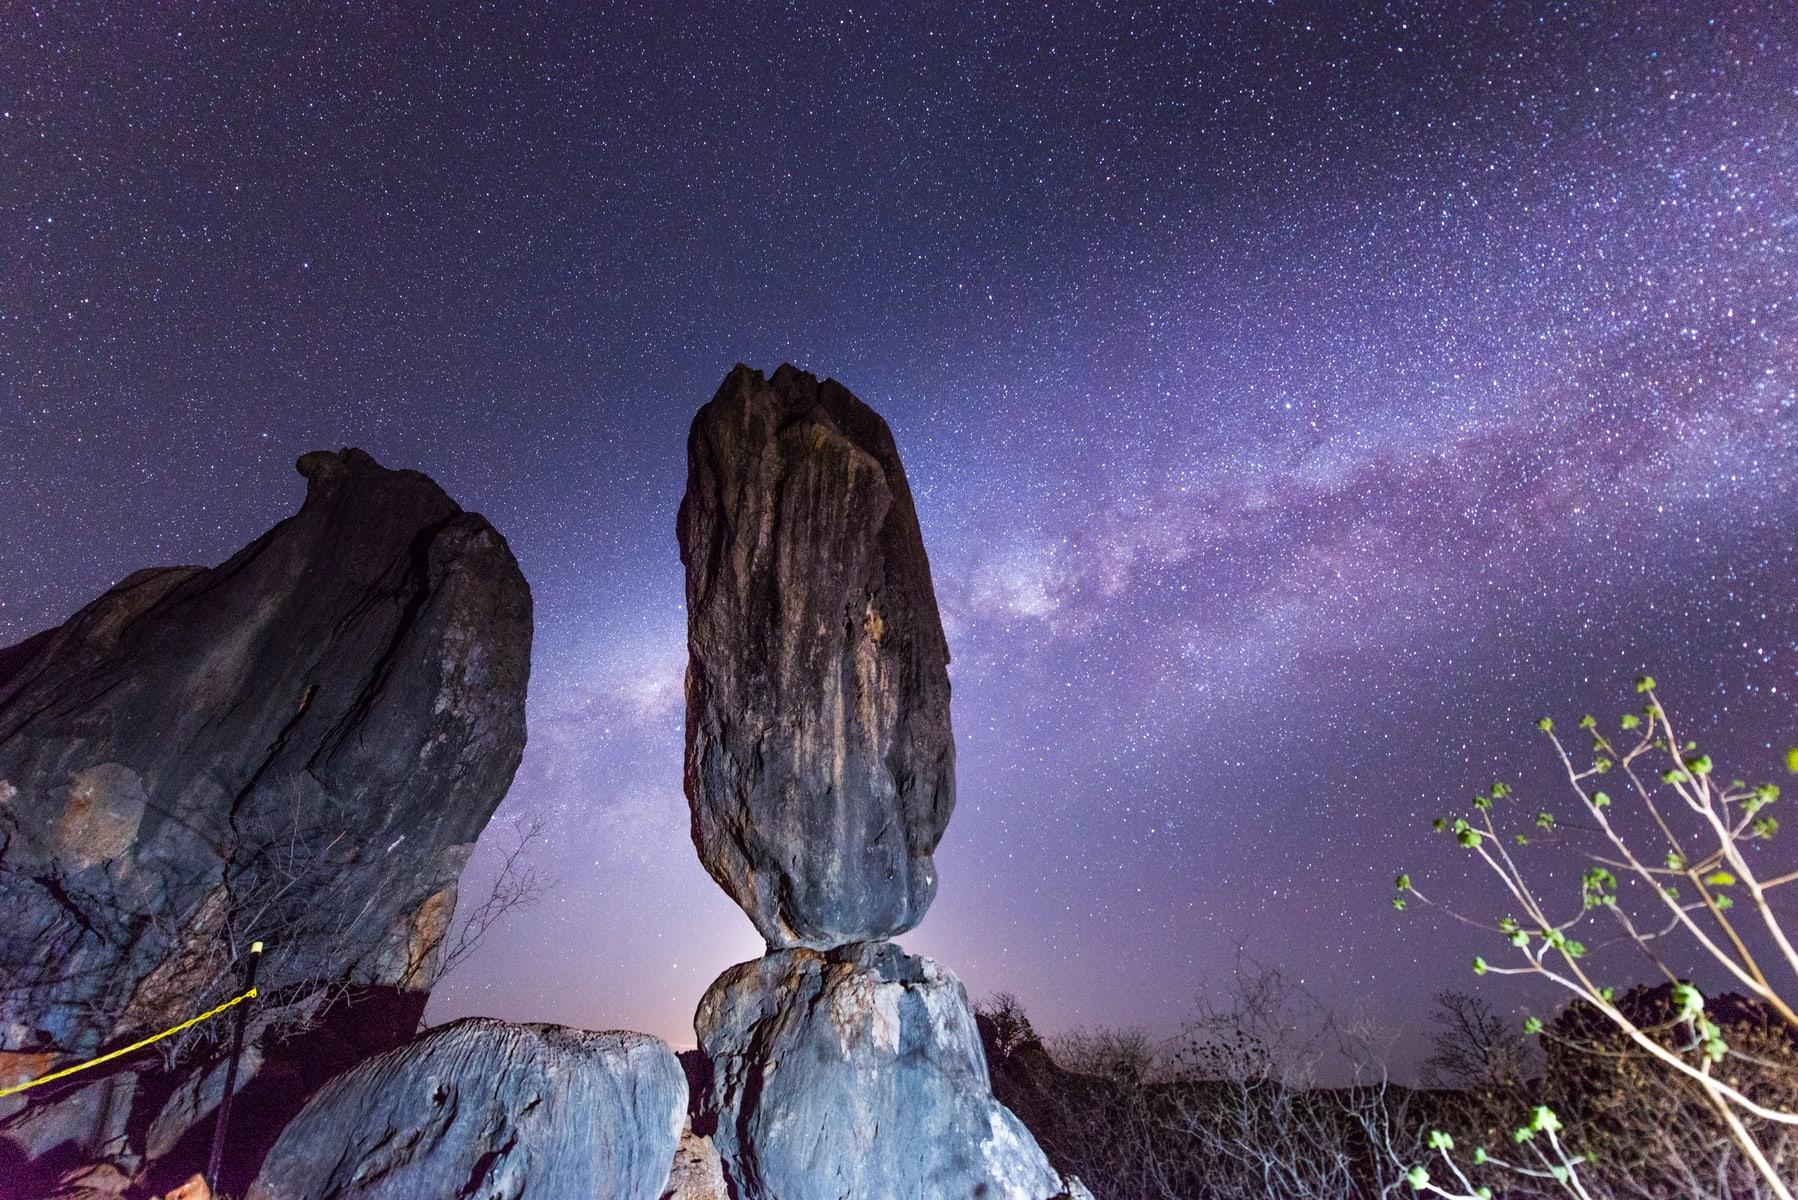 Starry night sky at the Balancing Rock in Chillagoe - Mareeba Shire